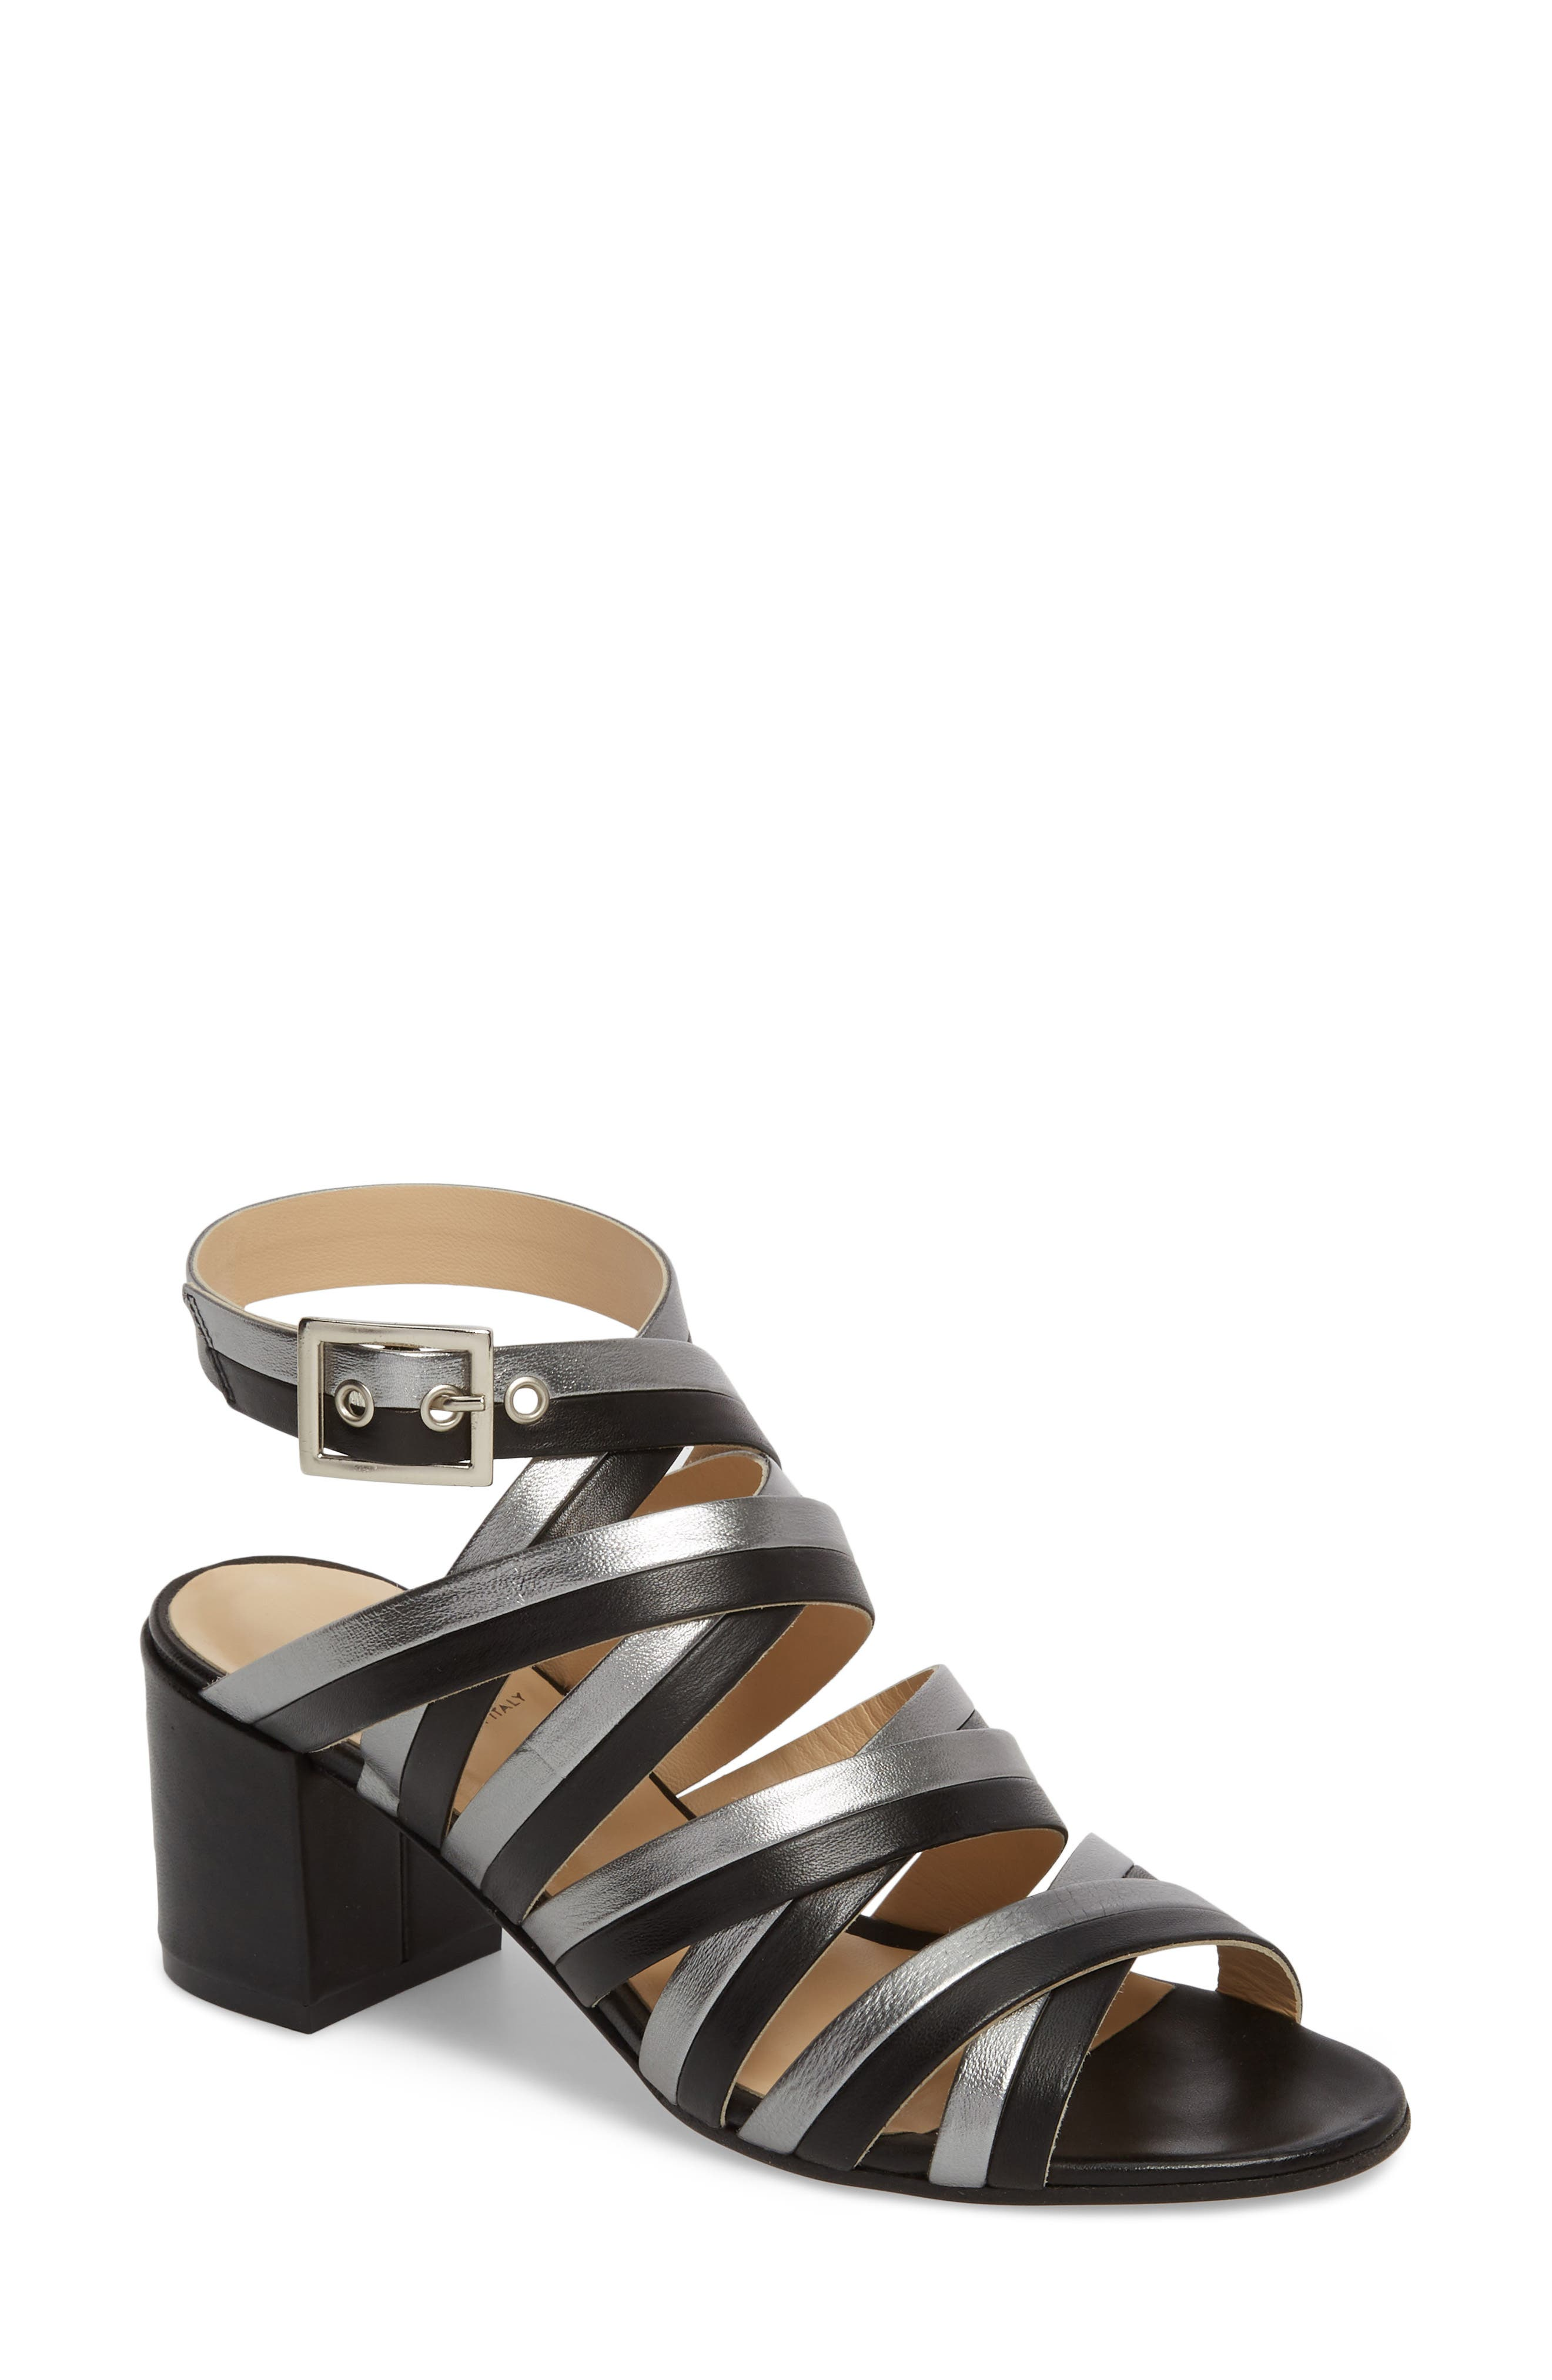 Leda Strappy Sandal,                             Main thumbnail 1, color,                             BLACK LEATHER